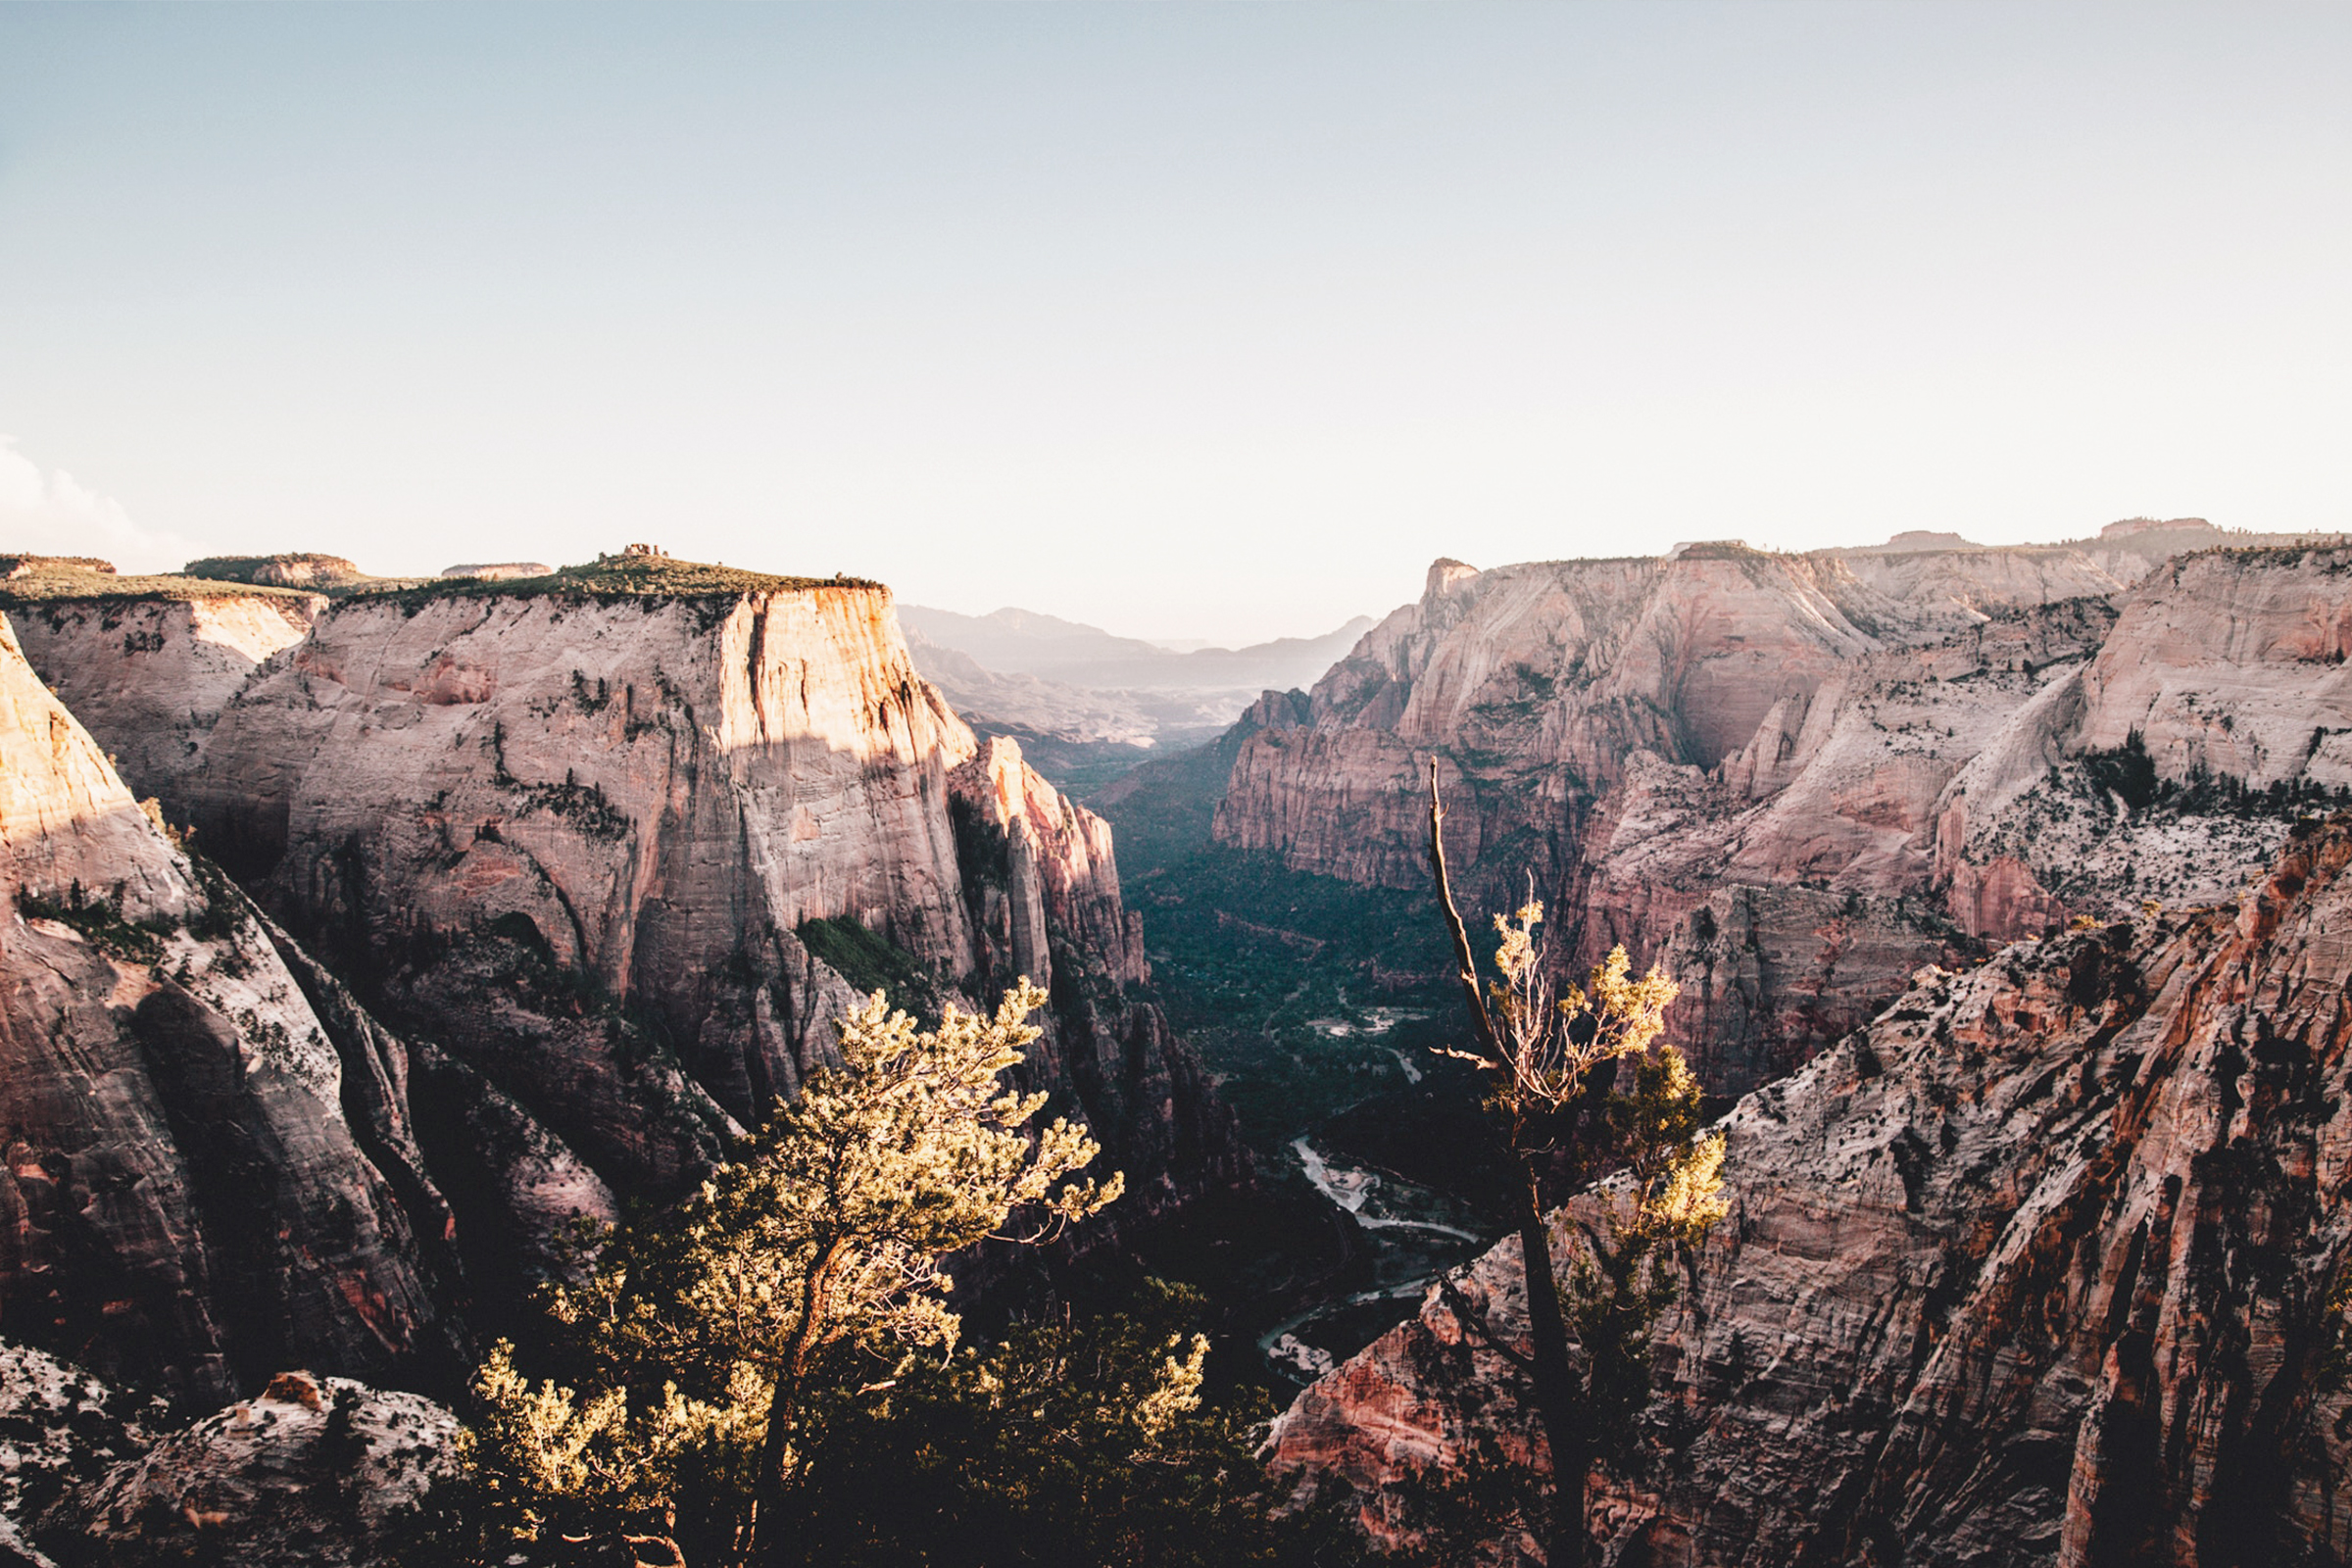 Must Do Road Trips in the US by Studio Ease #roadtrips #vacation #travel #wanderlust roads trips in the US, US road trip planner, best road trip ideas, best scenic road trip ideas in USA